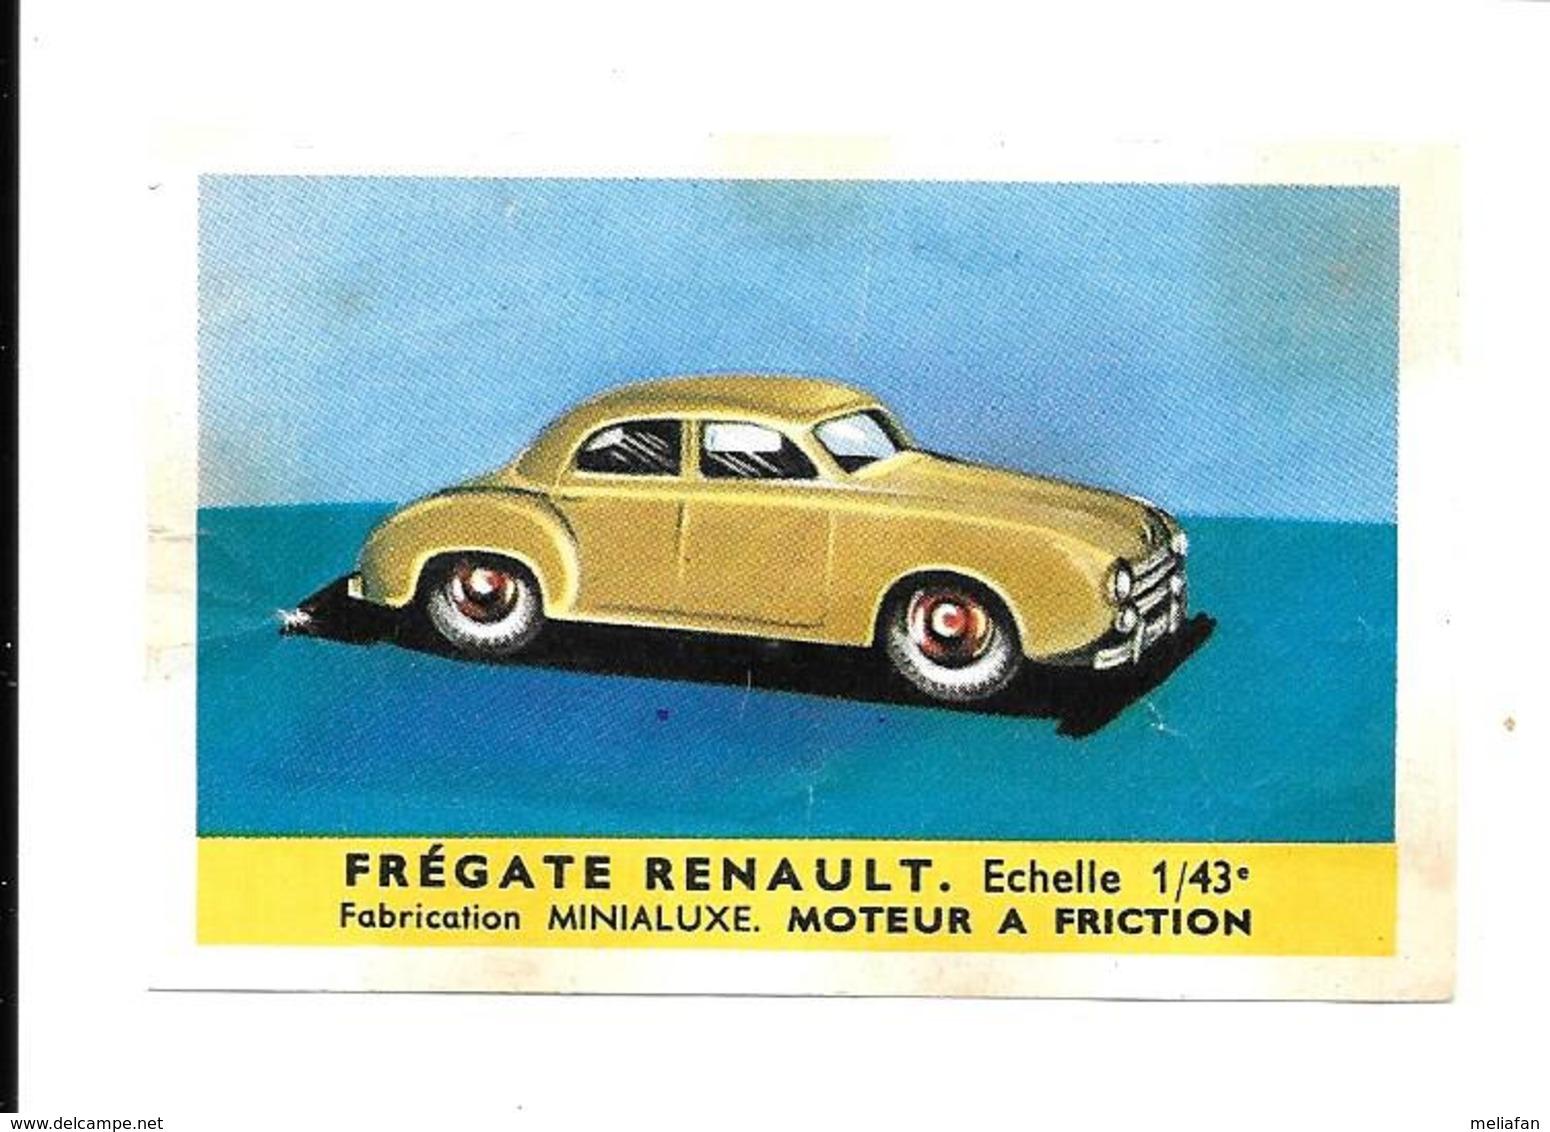 KB1352 - IMAGE CAFESMASDA - RENAULT FREGATE - Coches